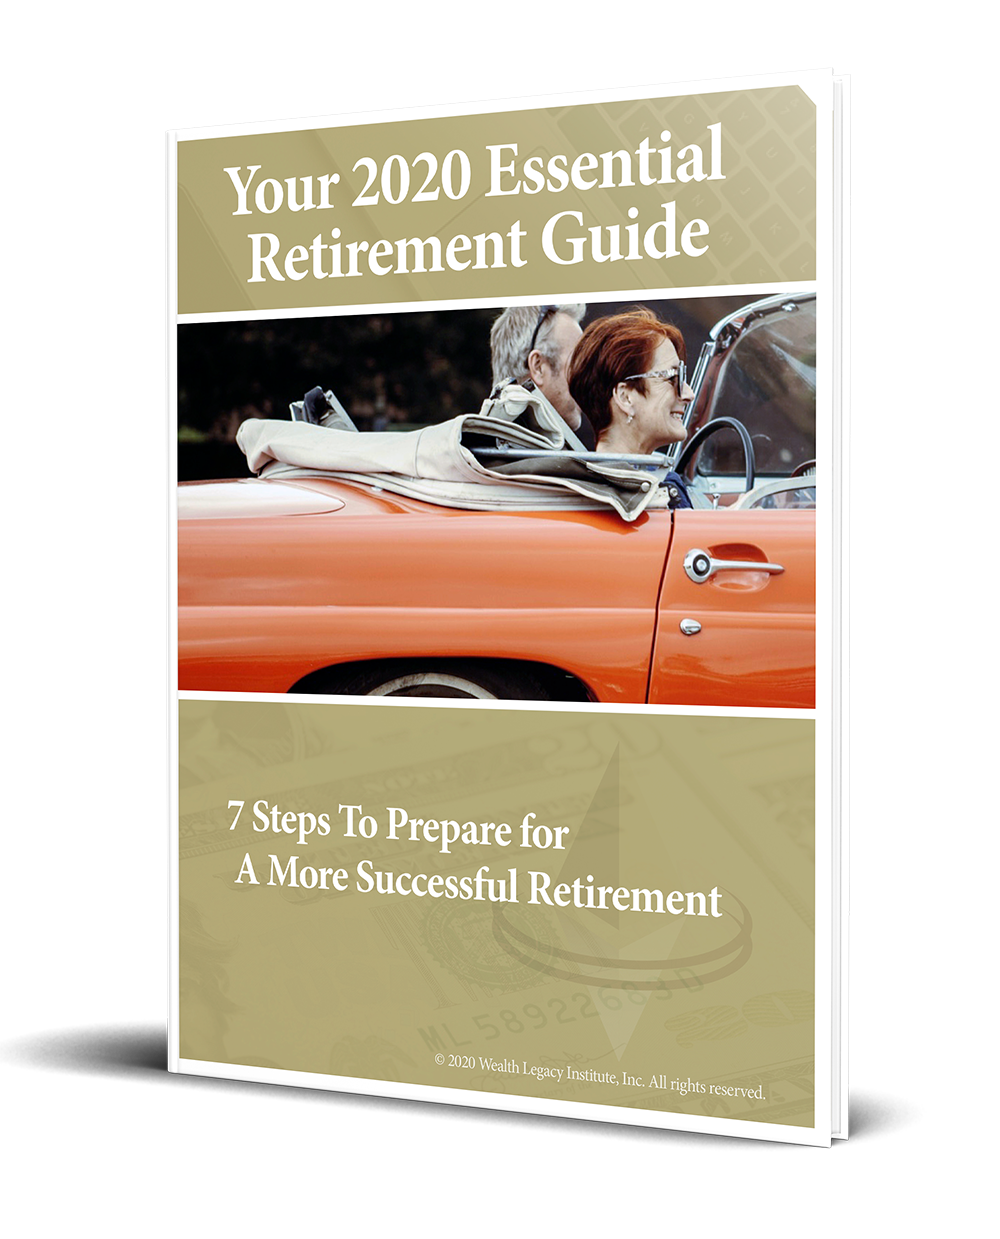 2020-Essential-Retirement-Guide-Book